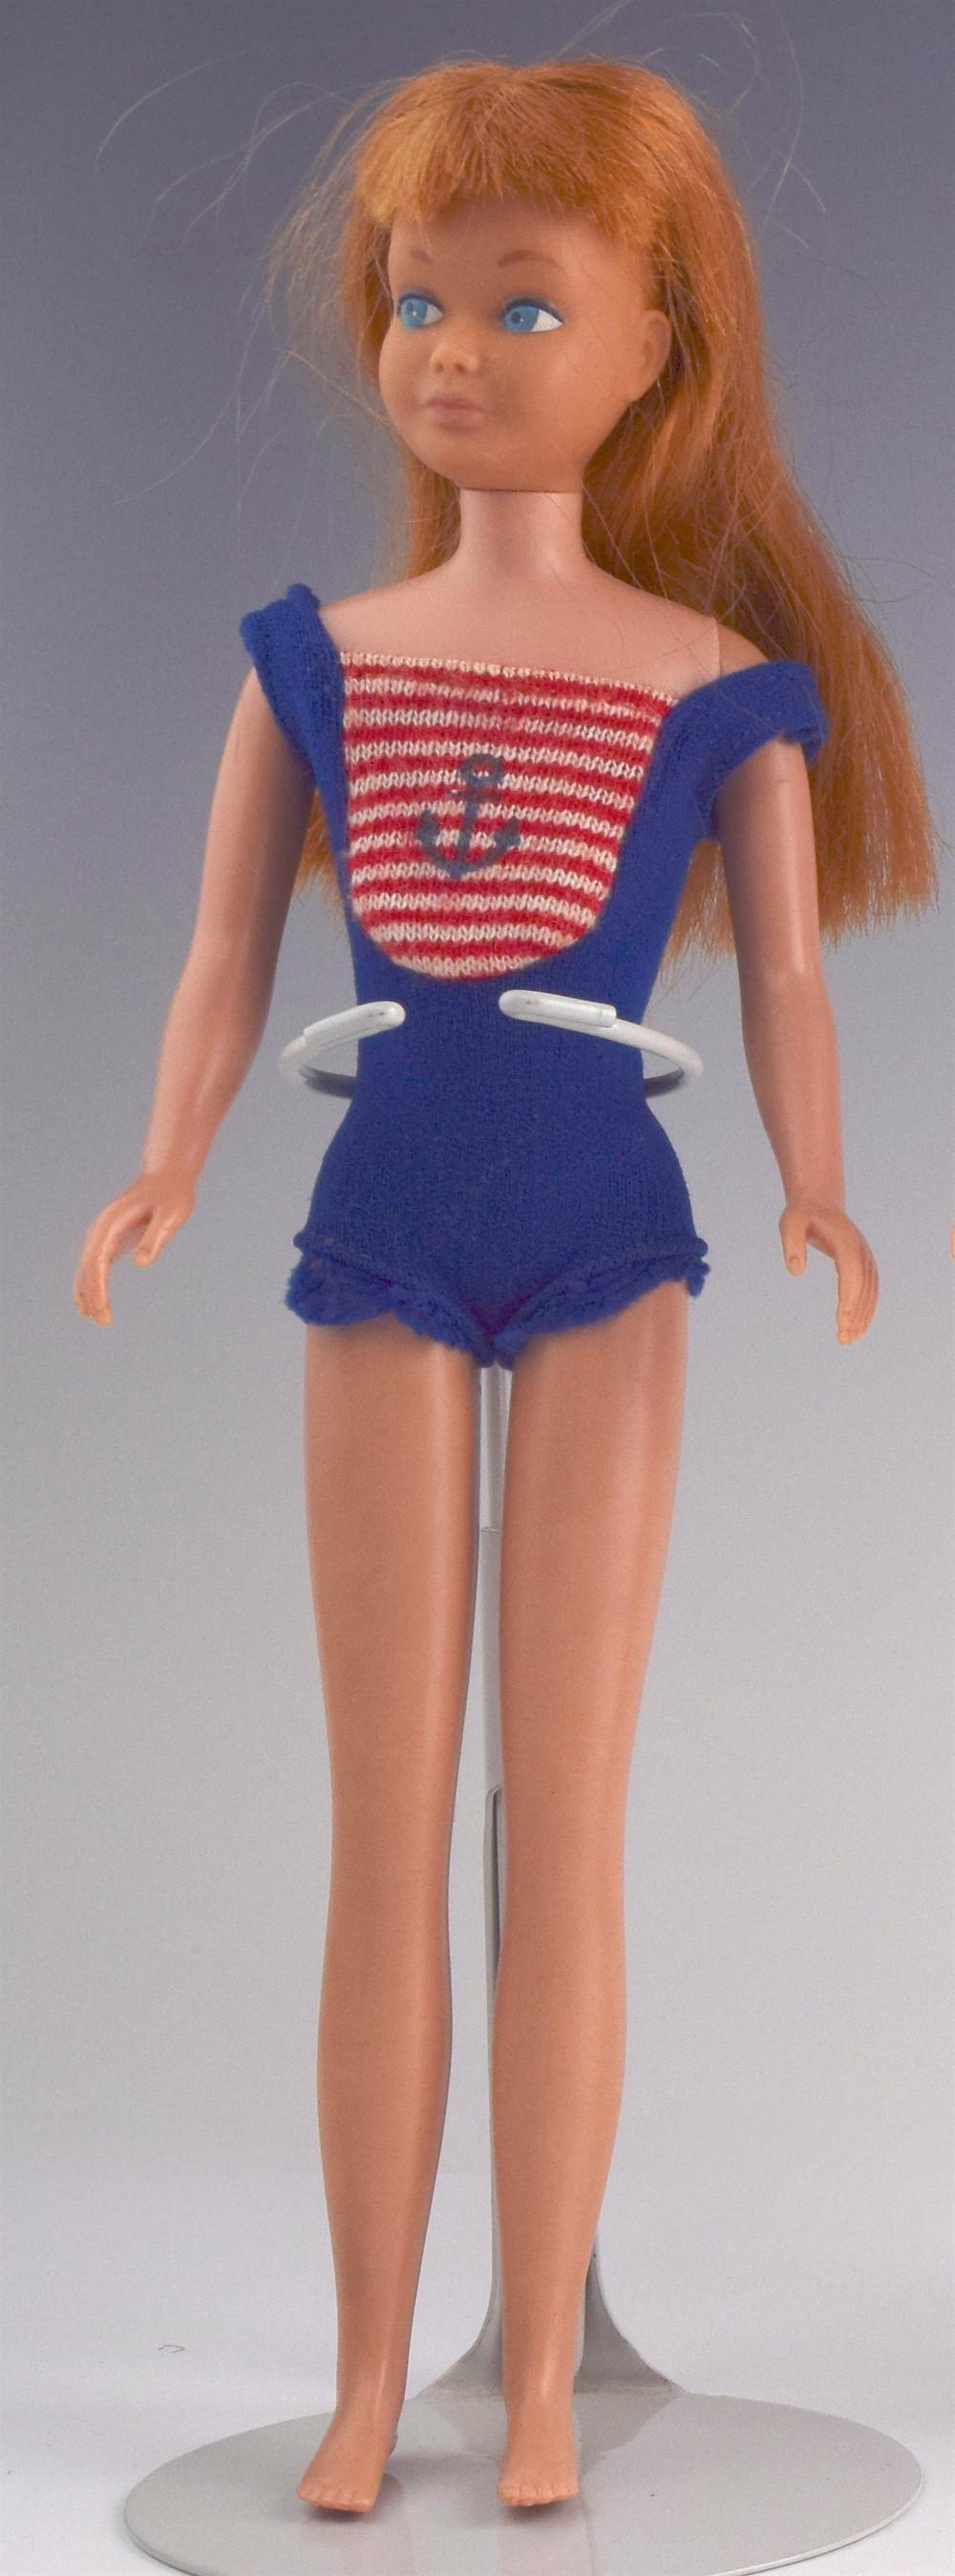 Mattel's Skipper Doll